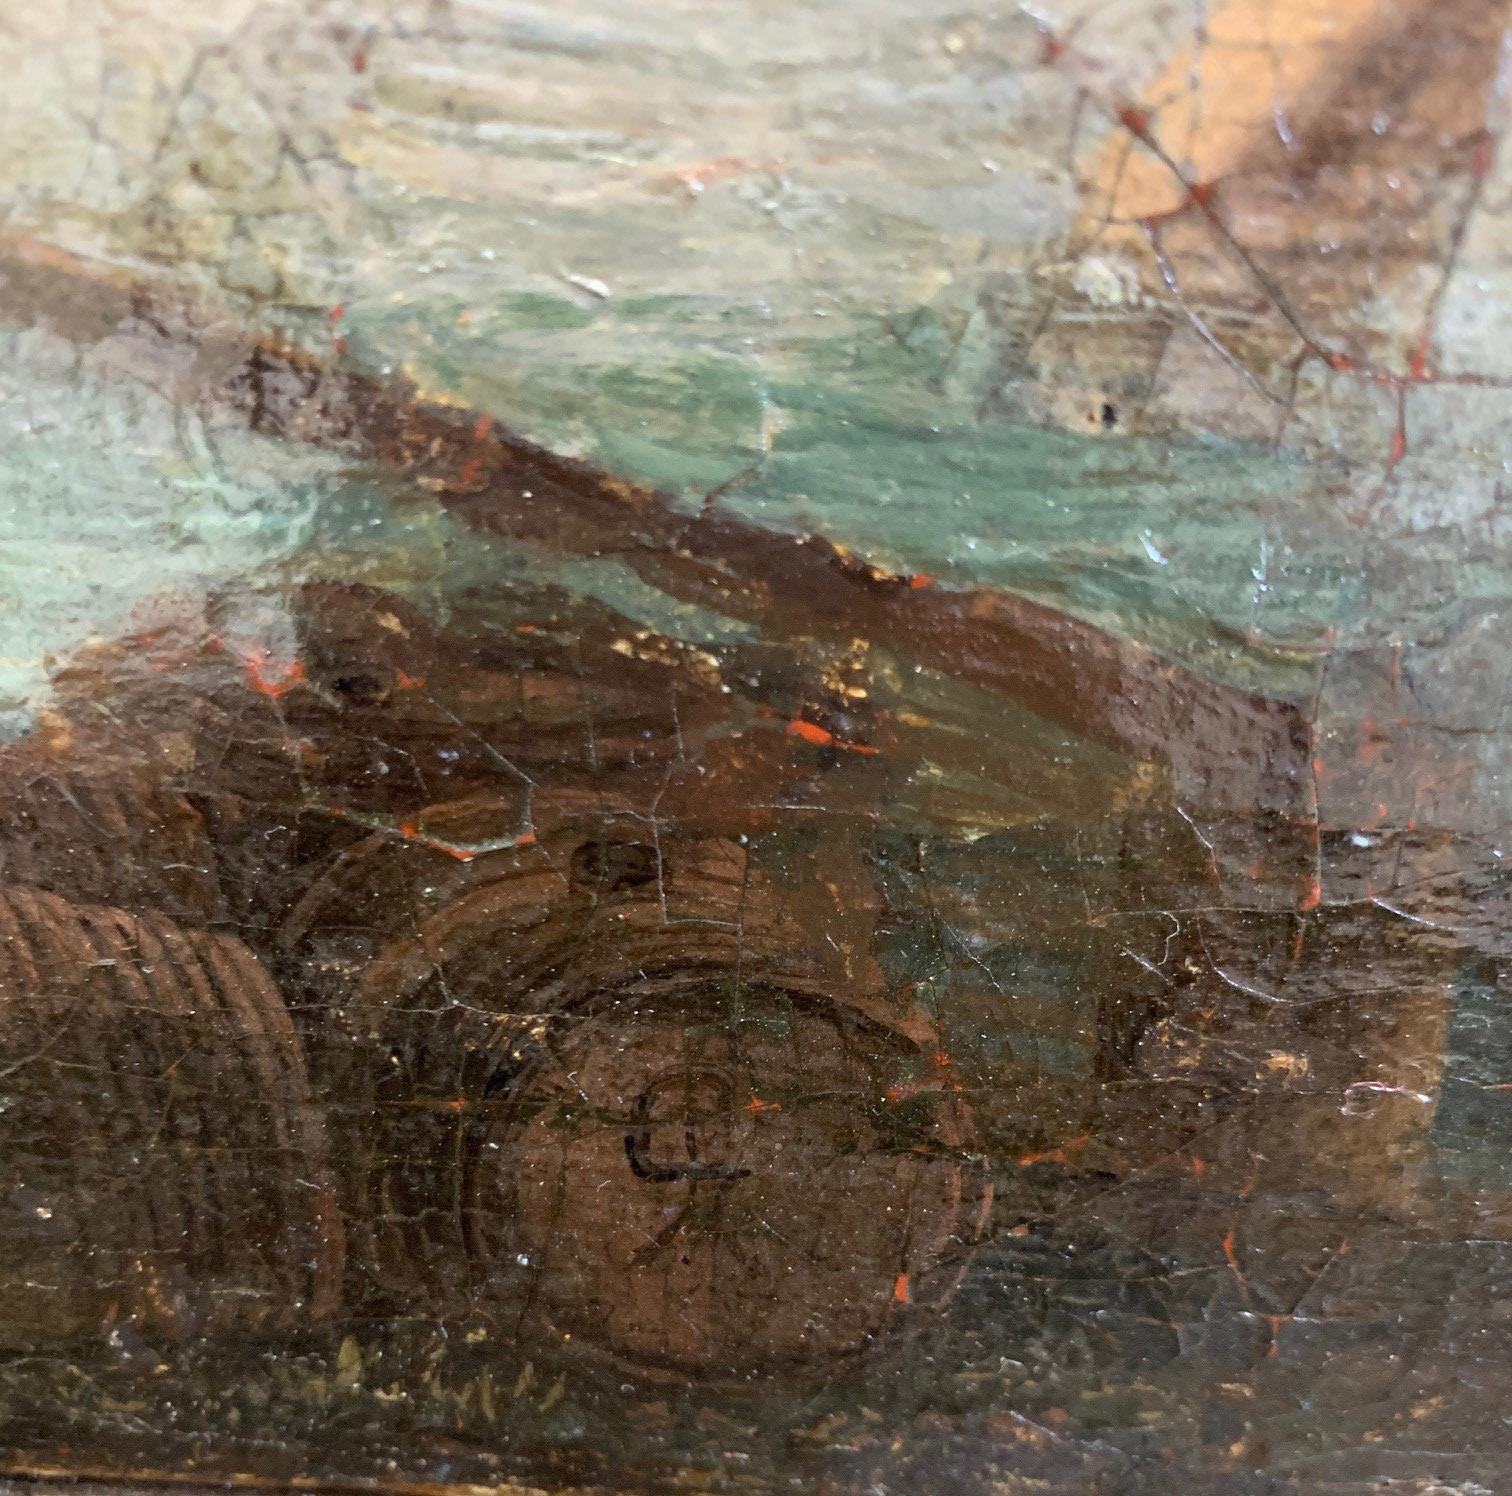 CIRCLE OF JAN VAN GOYEN, LEIDEN, 1596 - 1656, THE HAGUE, 17TH CENTURY OIL ON CANVAS River landscape, - Image 10 of 12